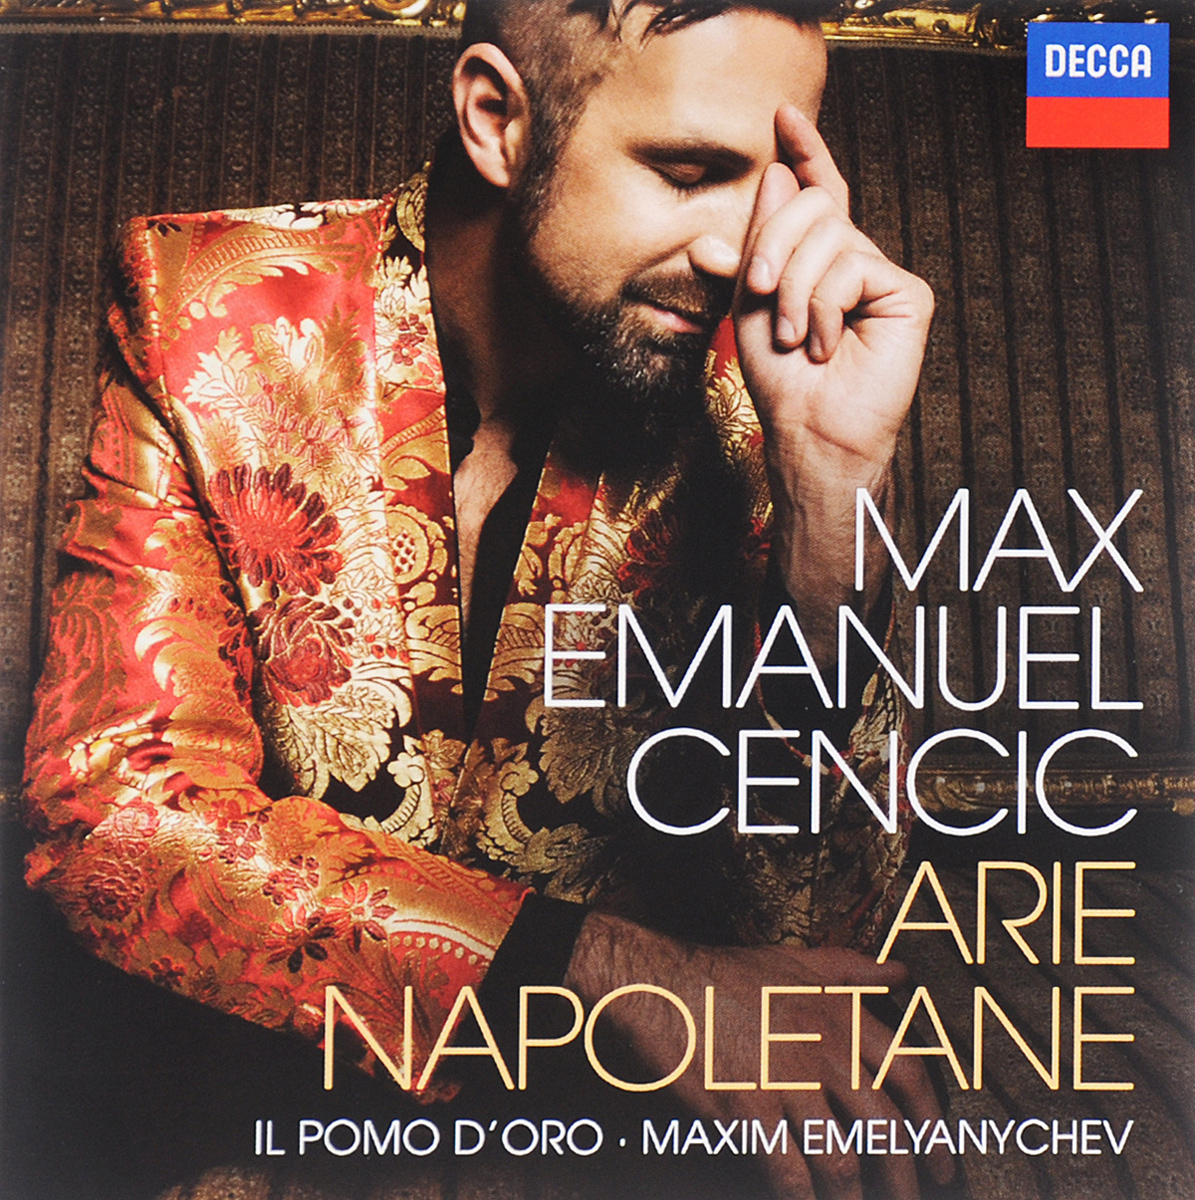 Макс Эмануэль Ценчич,Il Pomo d'Oro,Максим Емельянычев Max Emanuel Cencic. Arie Napolitane n matteis arie diverse per il violino